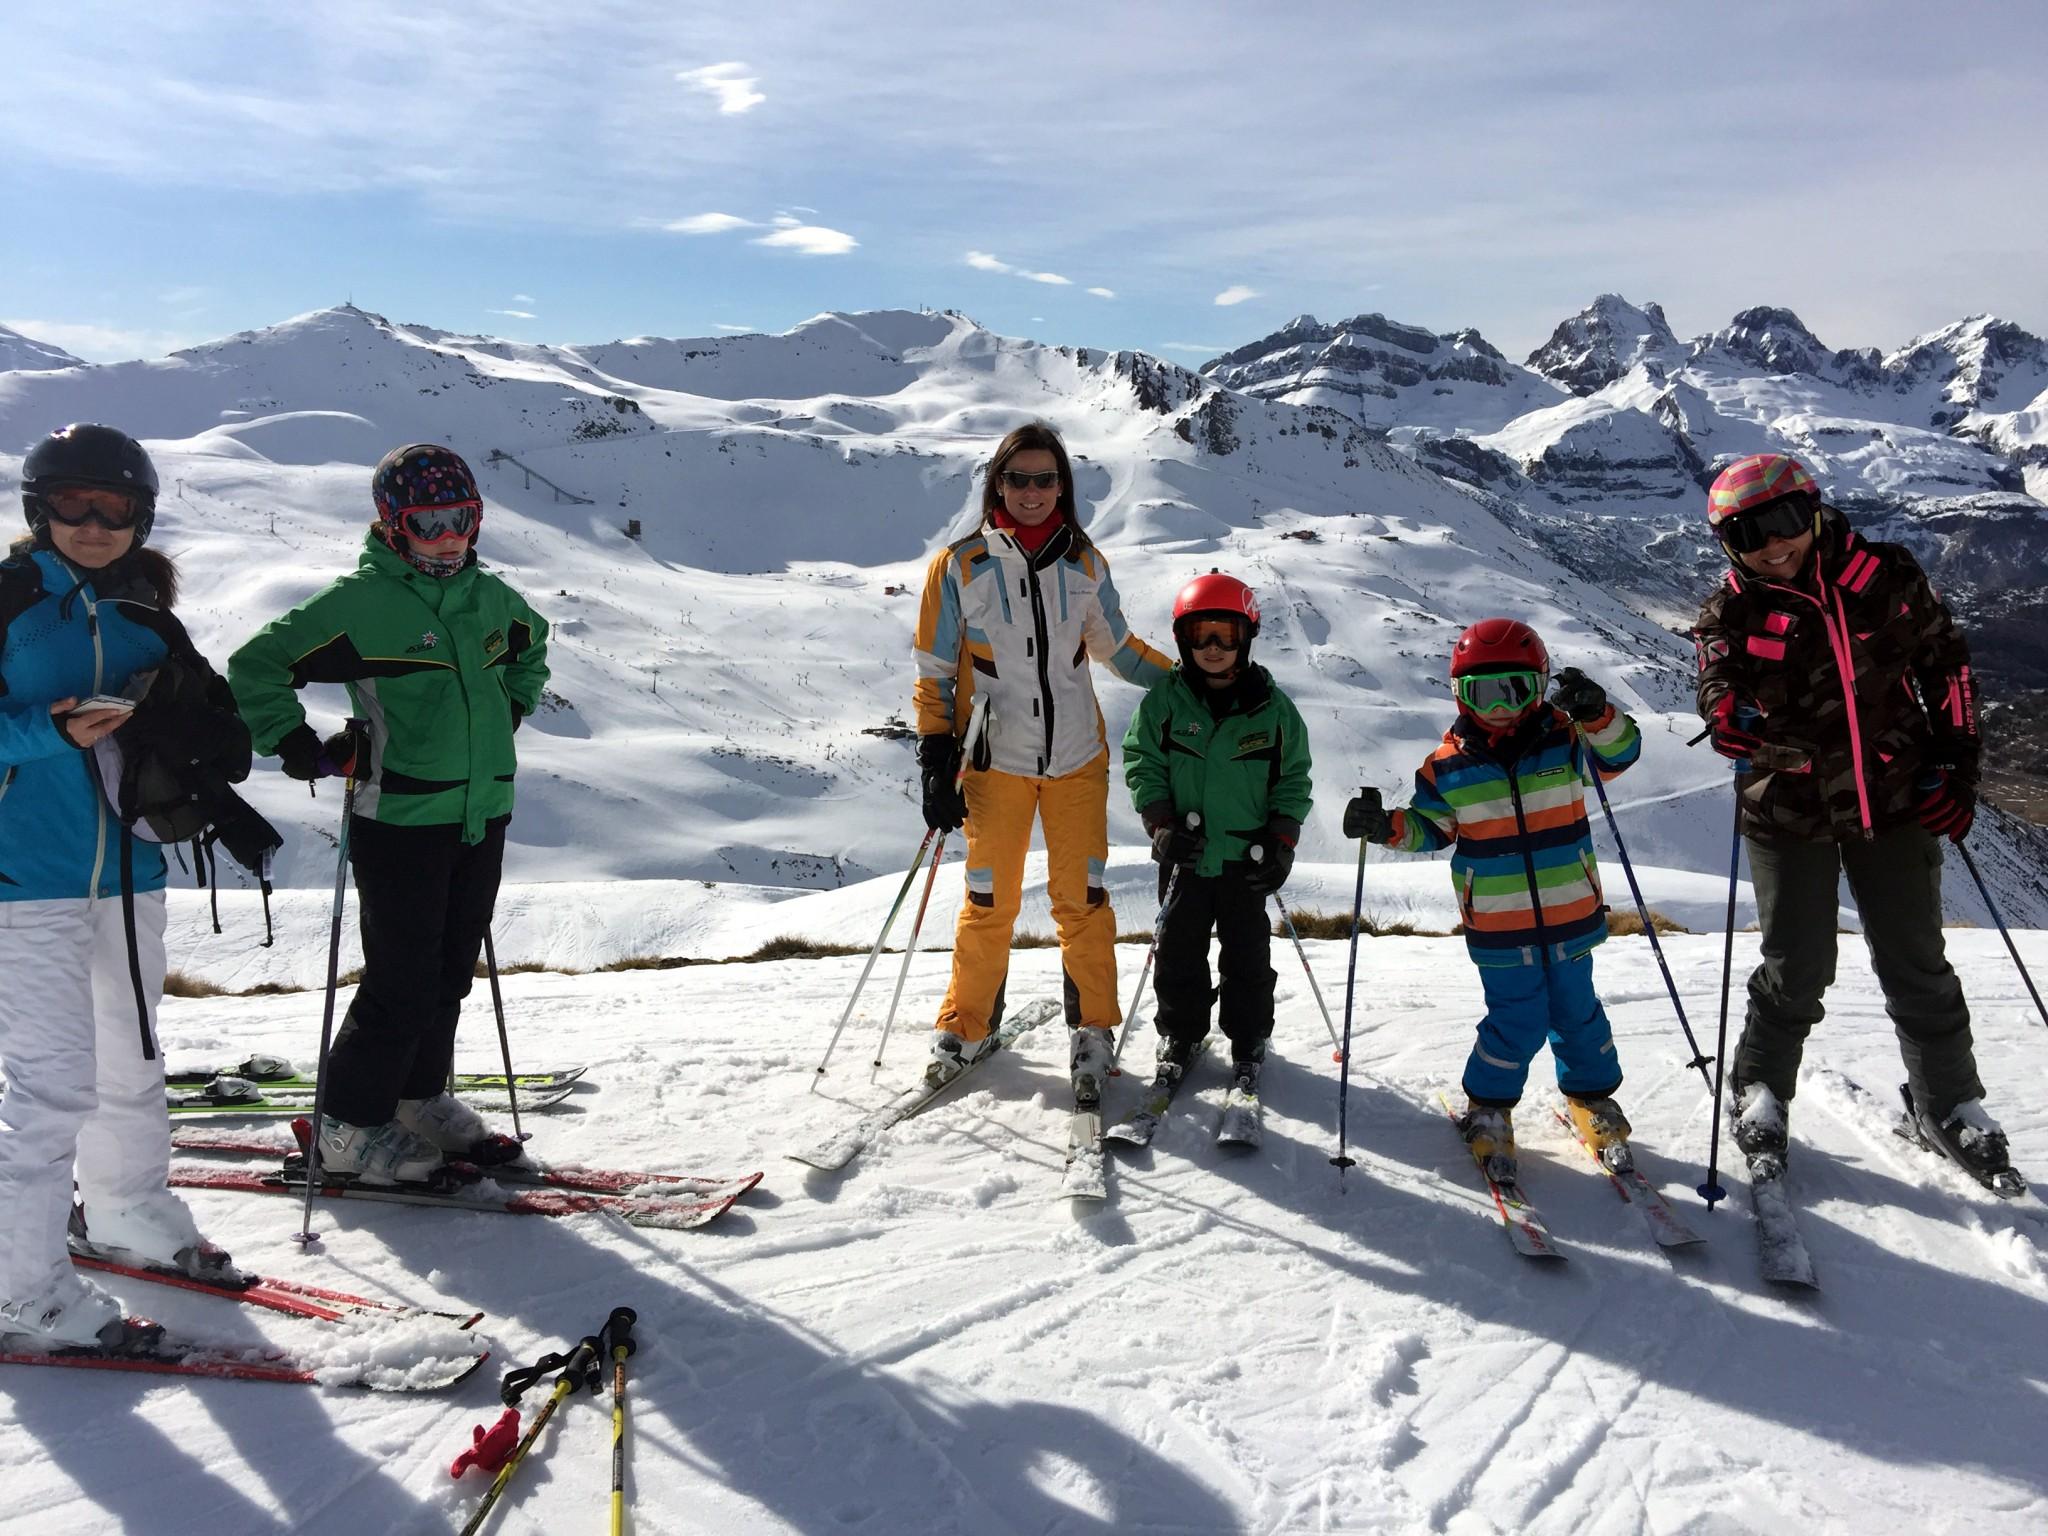 Viajes de esquí para familias